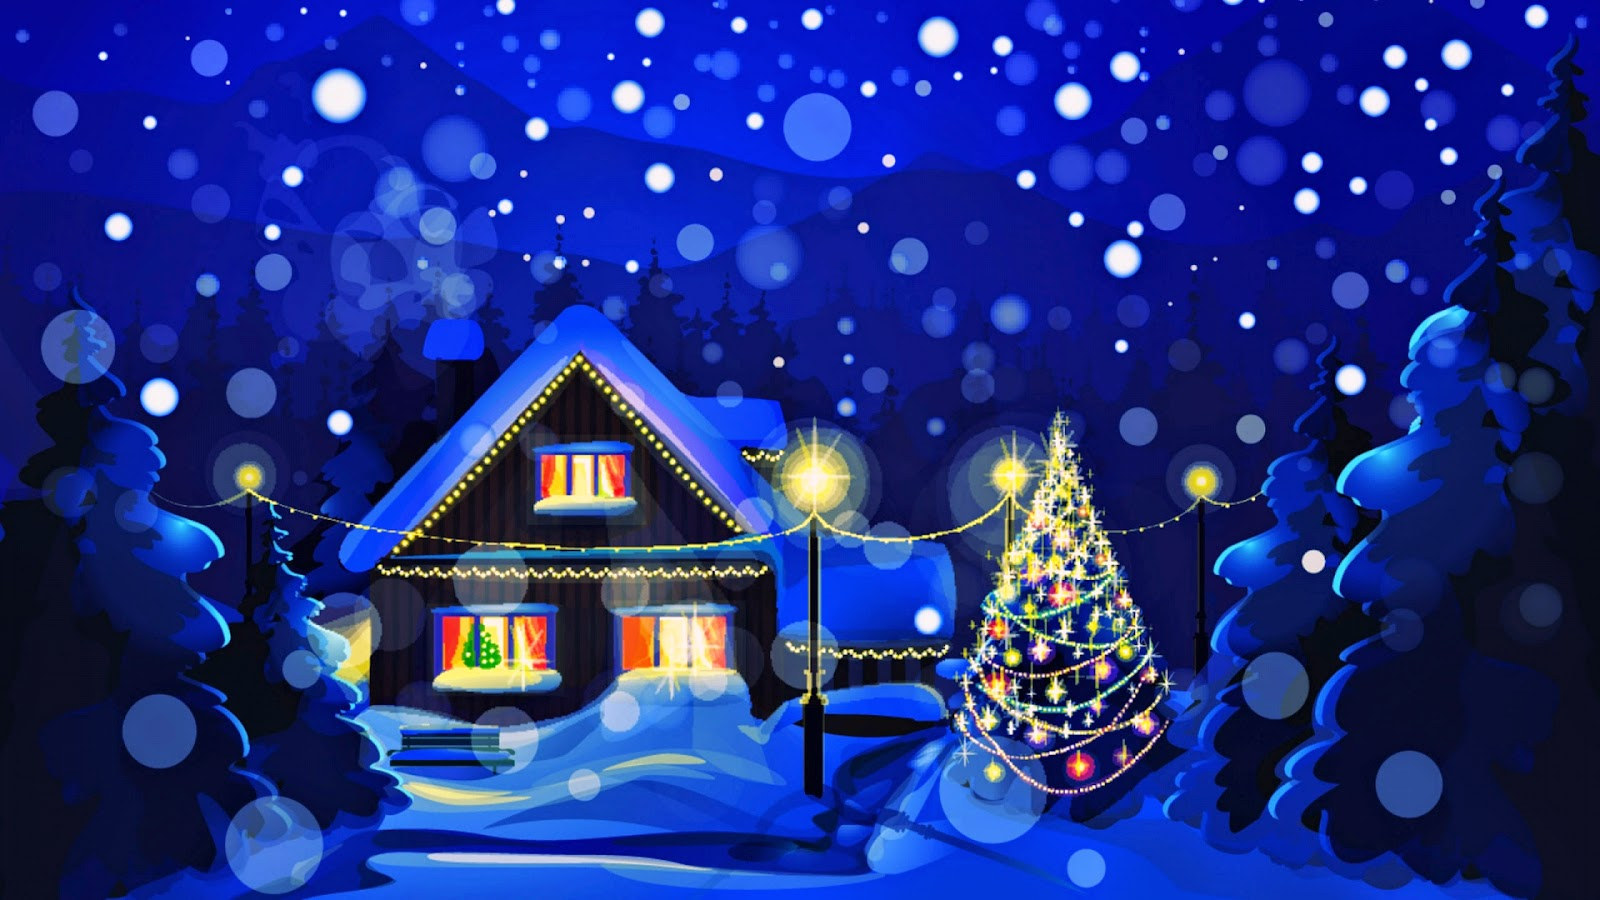 Christmas wallpaper hd 1080p full version free crack - Hd christmas wallpapers 1080p ...